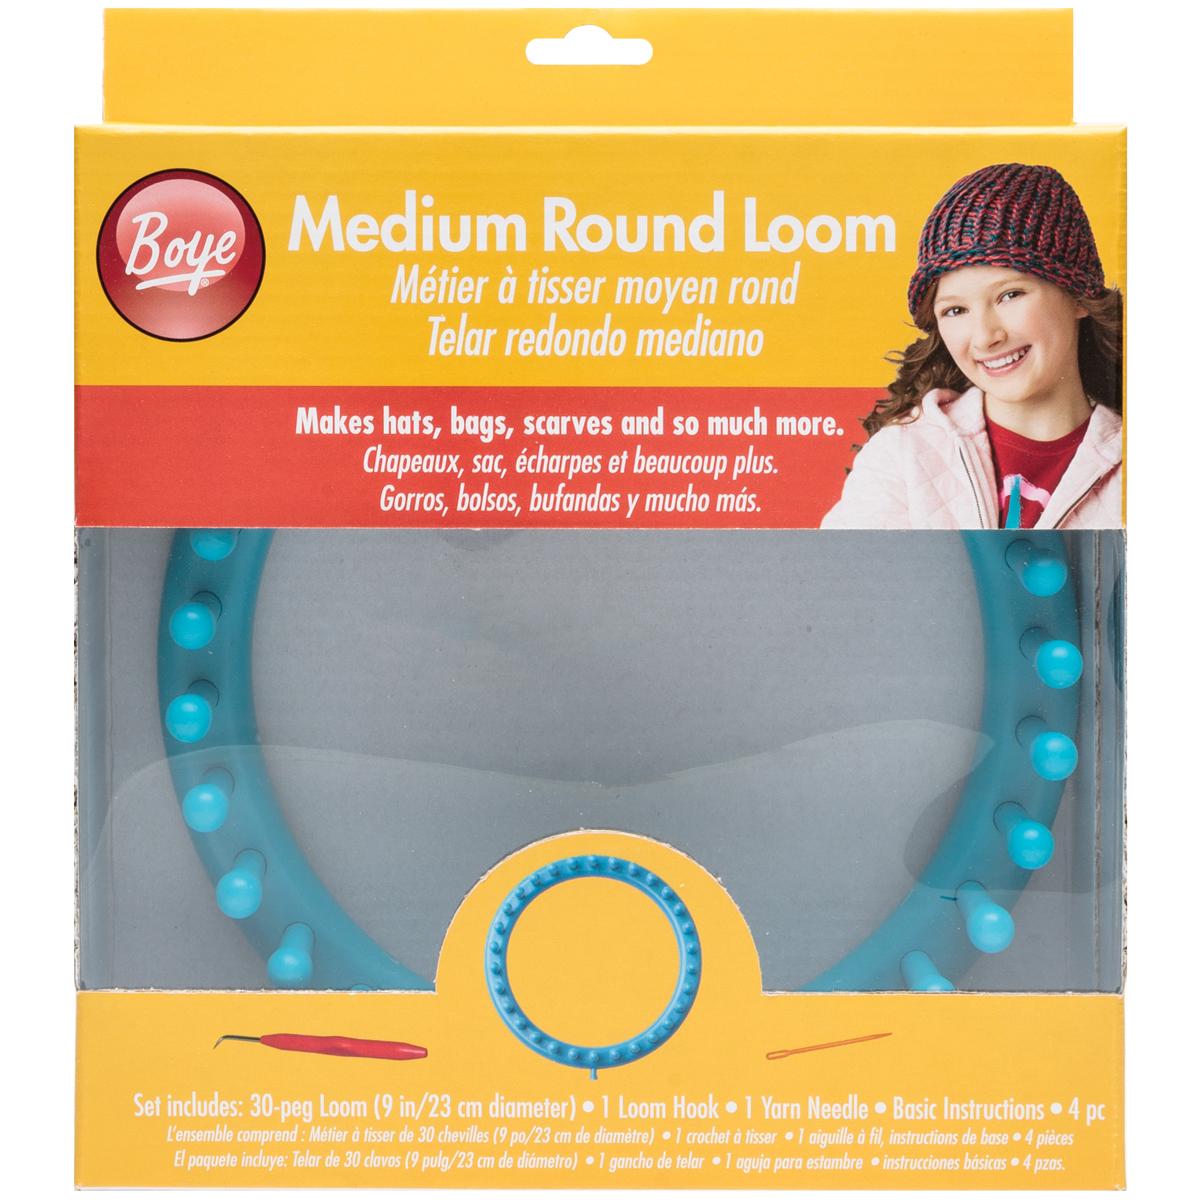 Boye Medium Round Loom Joann